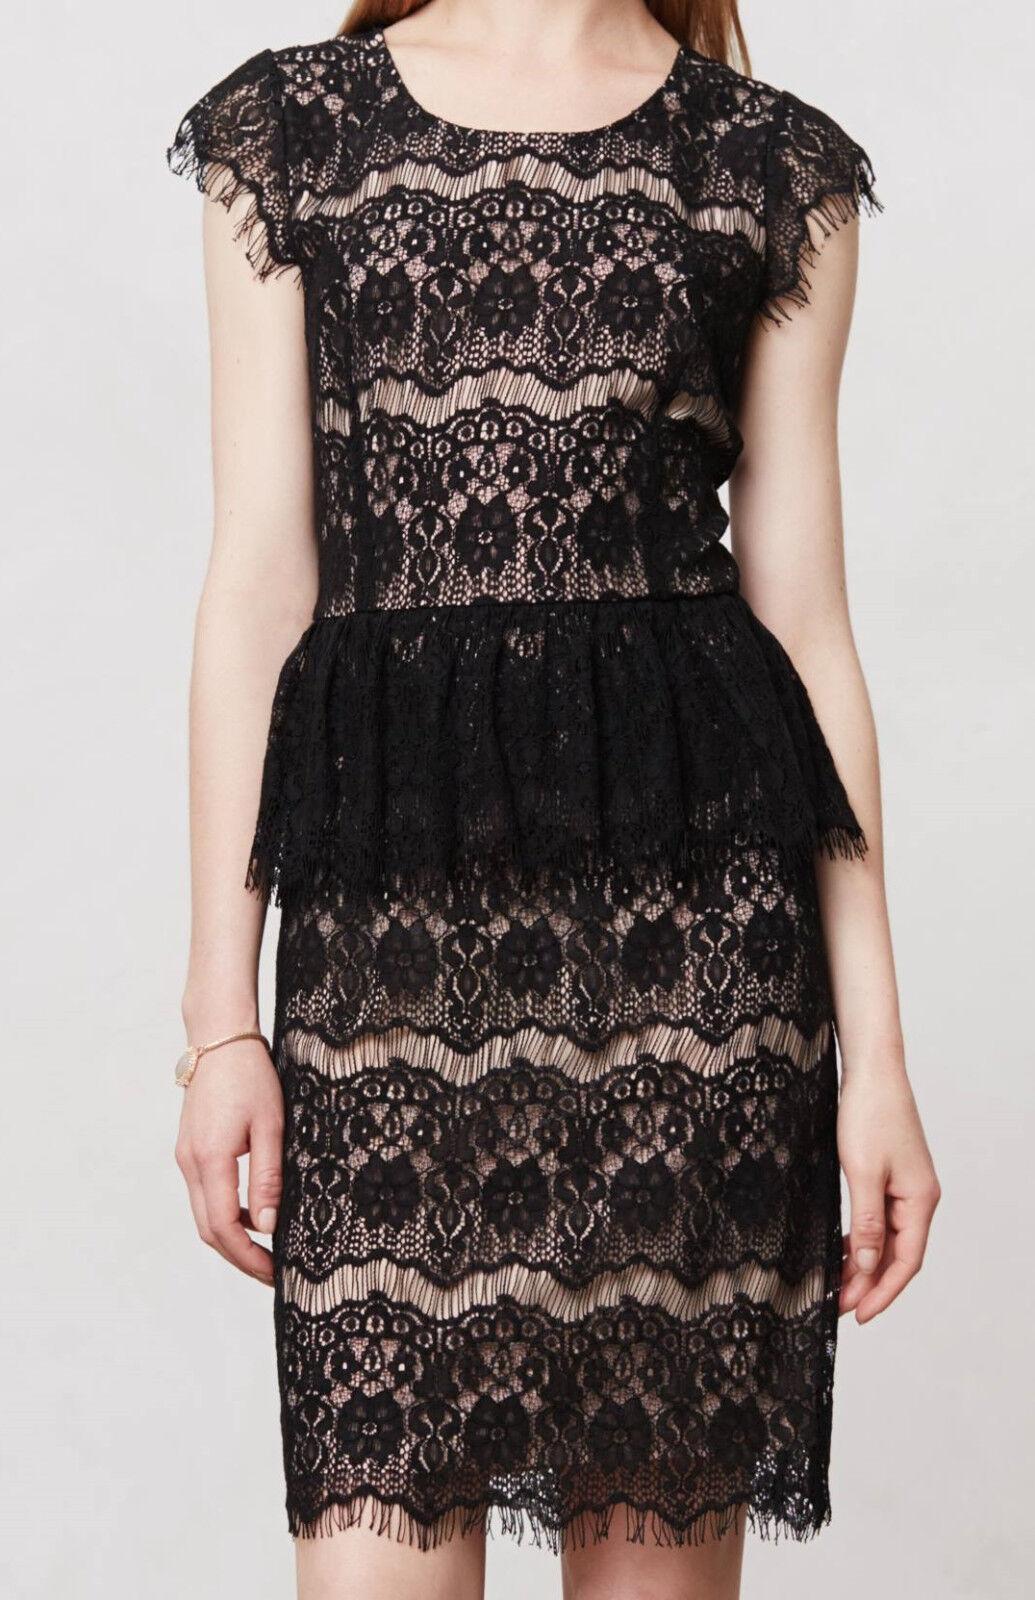 Maeve Lace Sheath Elsa Peplum Dress Größe Large Various Farbe NW ANTHROPOLOGIE Ta